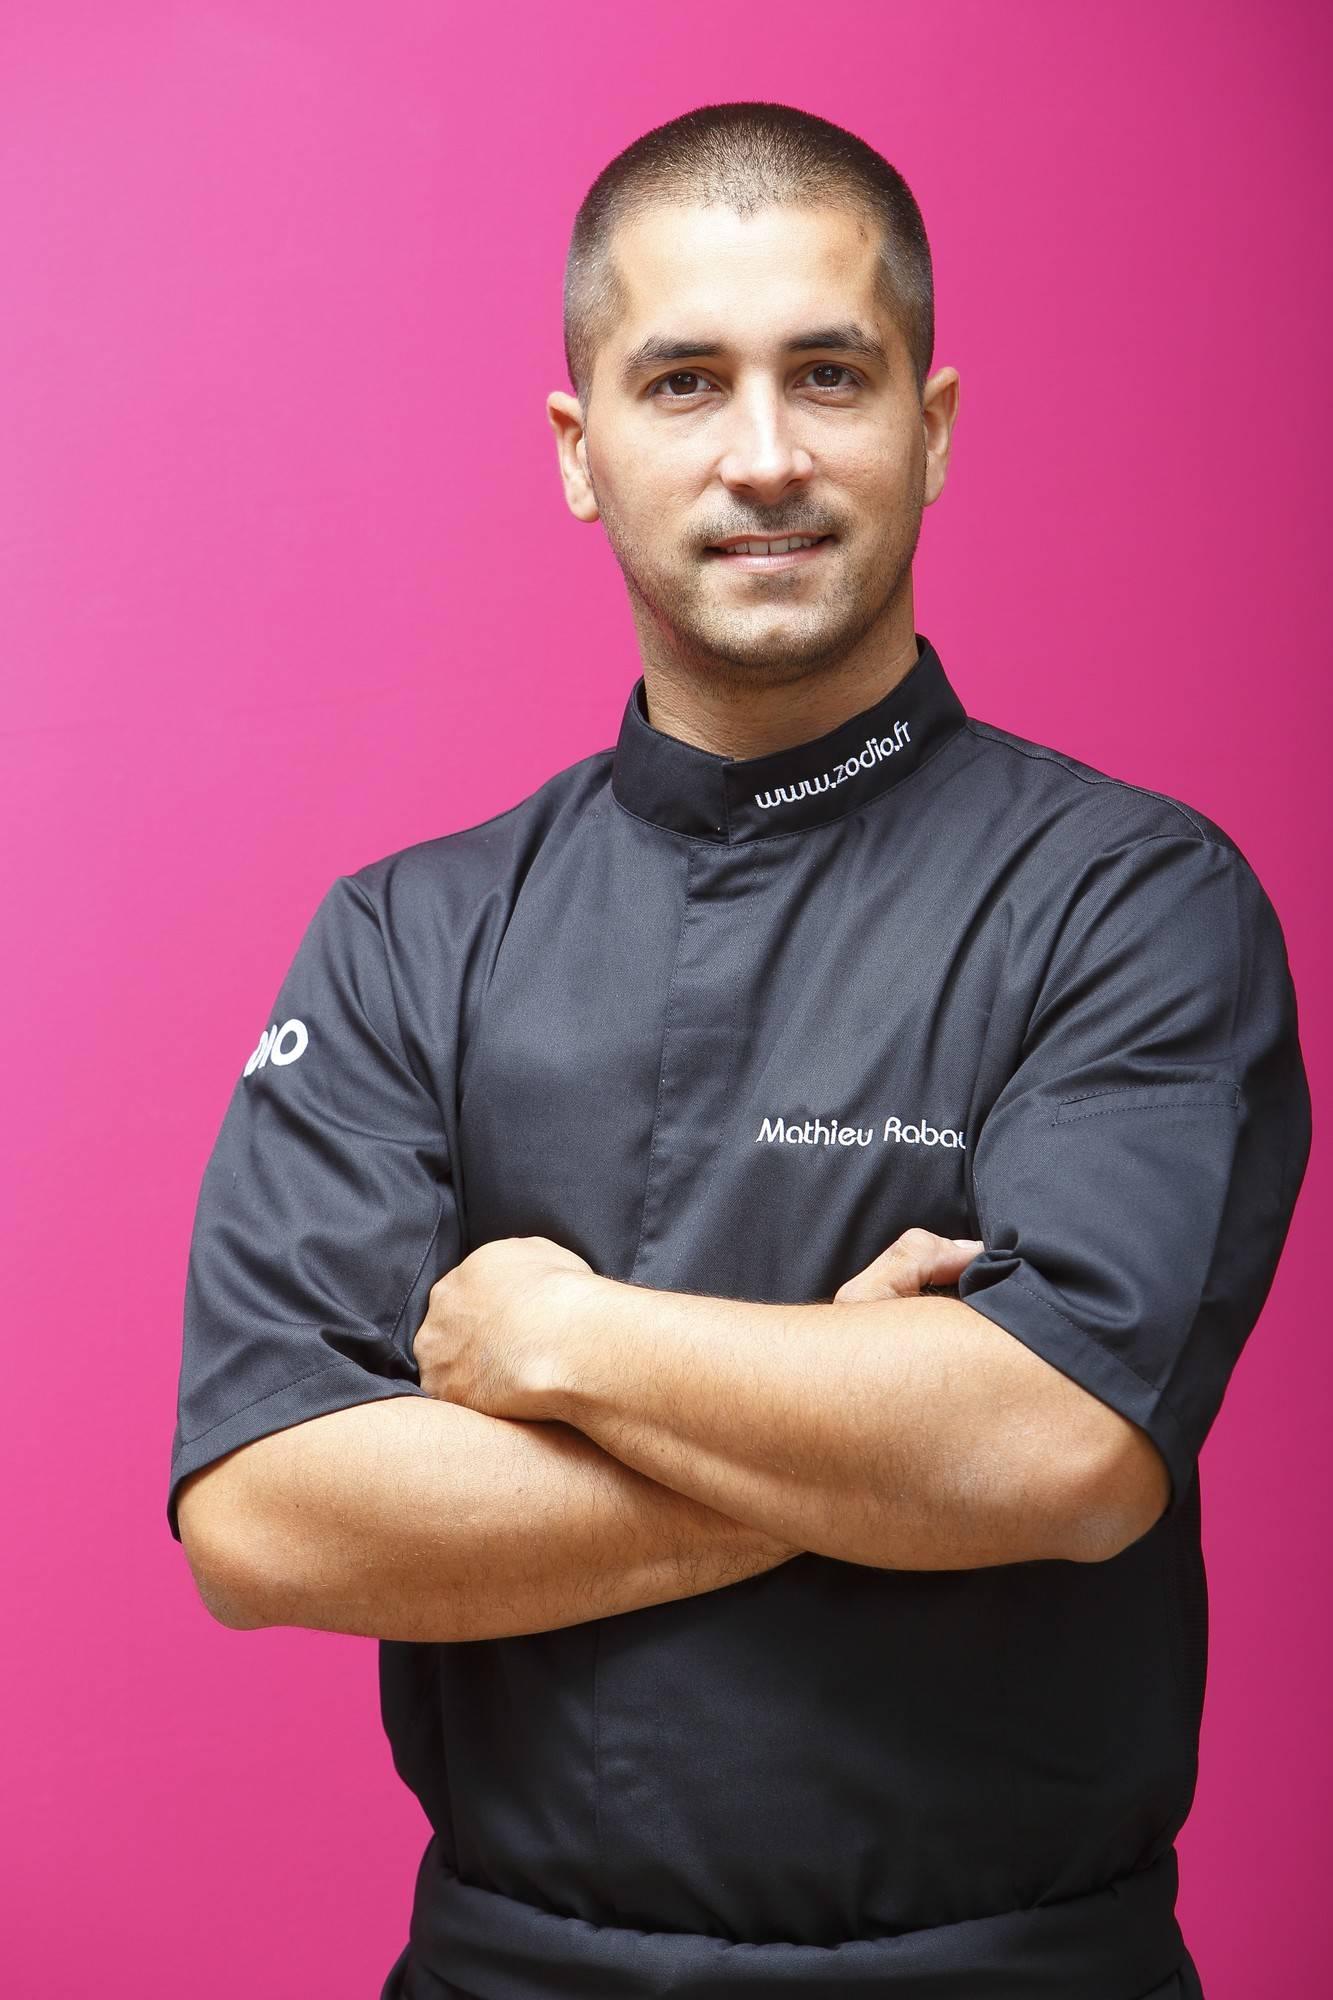 Vos ateliers cuisine blog z dio - Zodio chambourcy atelier cuisine ...